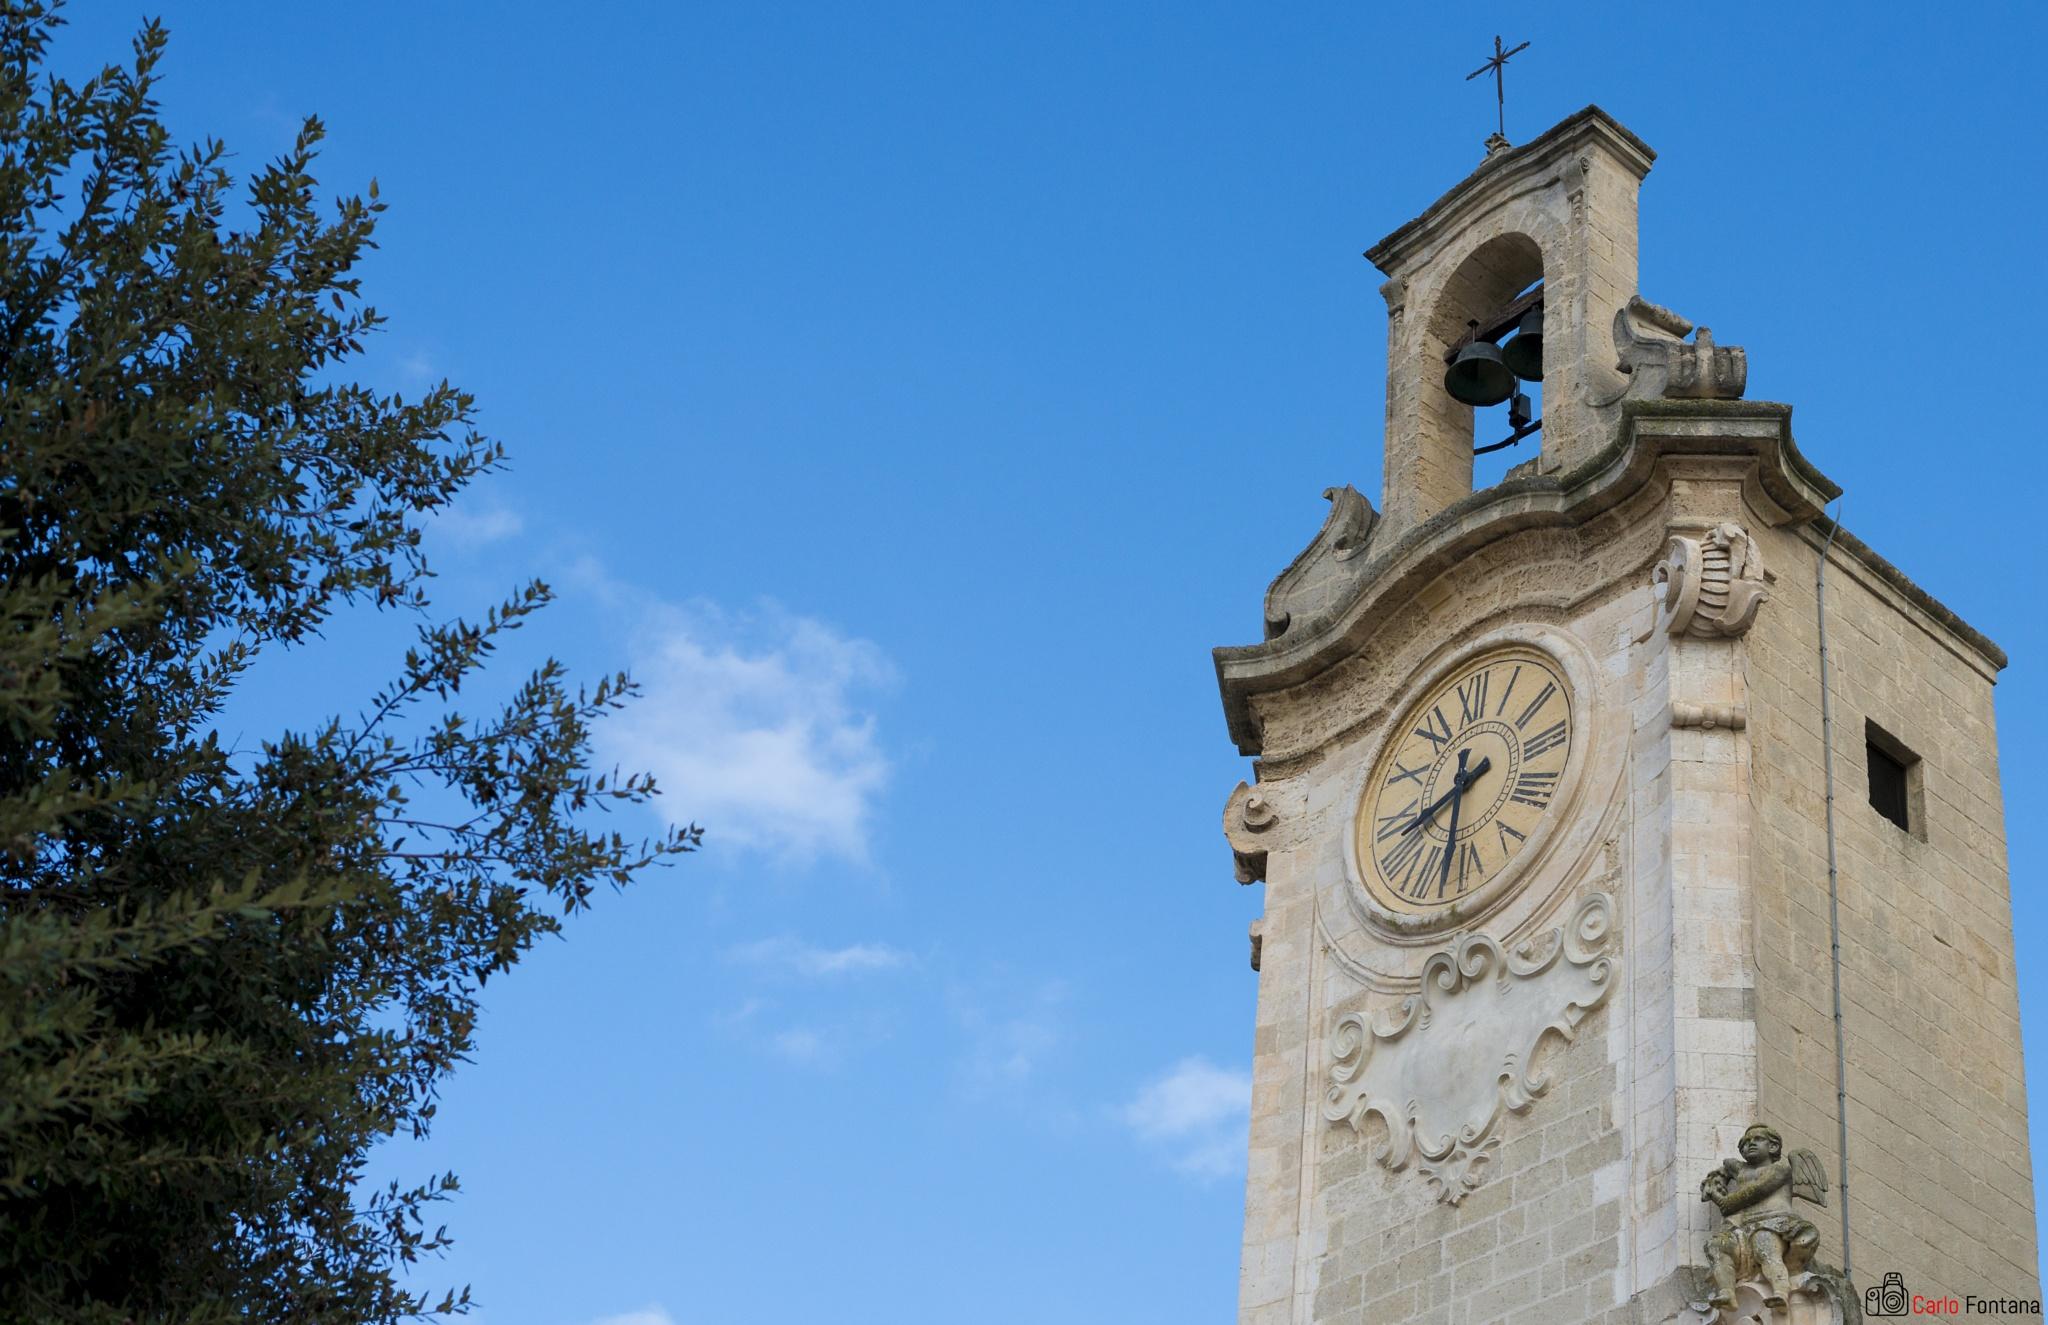 Clock Tower by Carlo Fontana